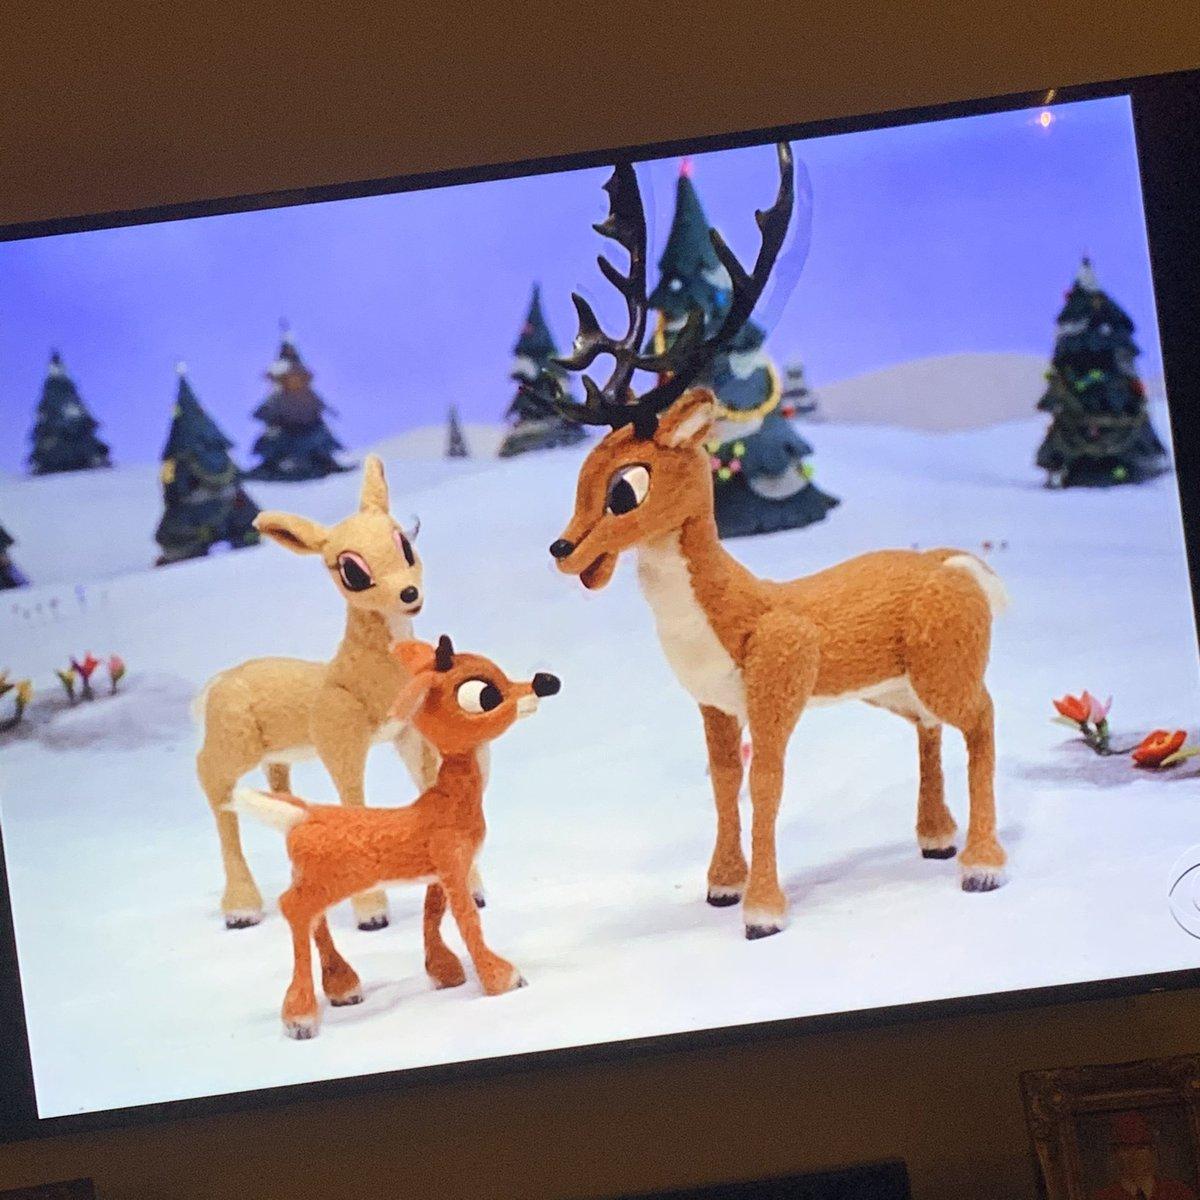 @DLoesch's photo on #RudolphTheRedNosedReindeer